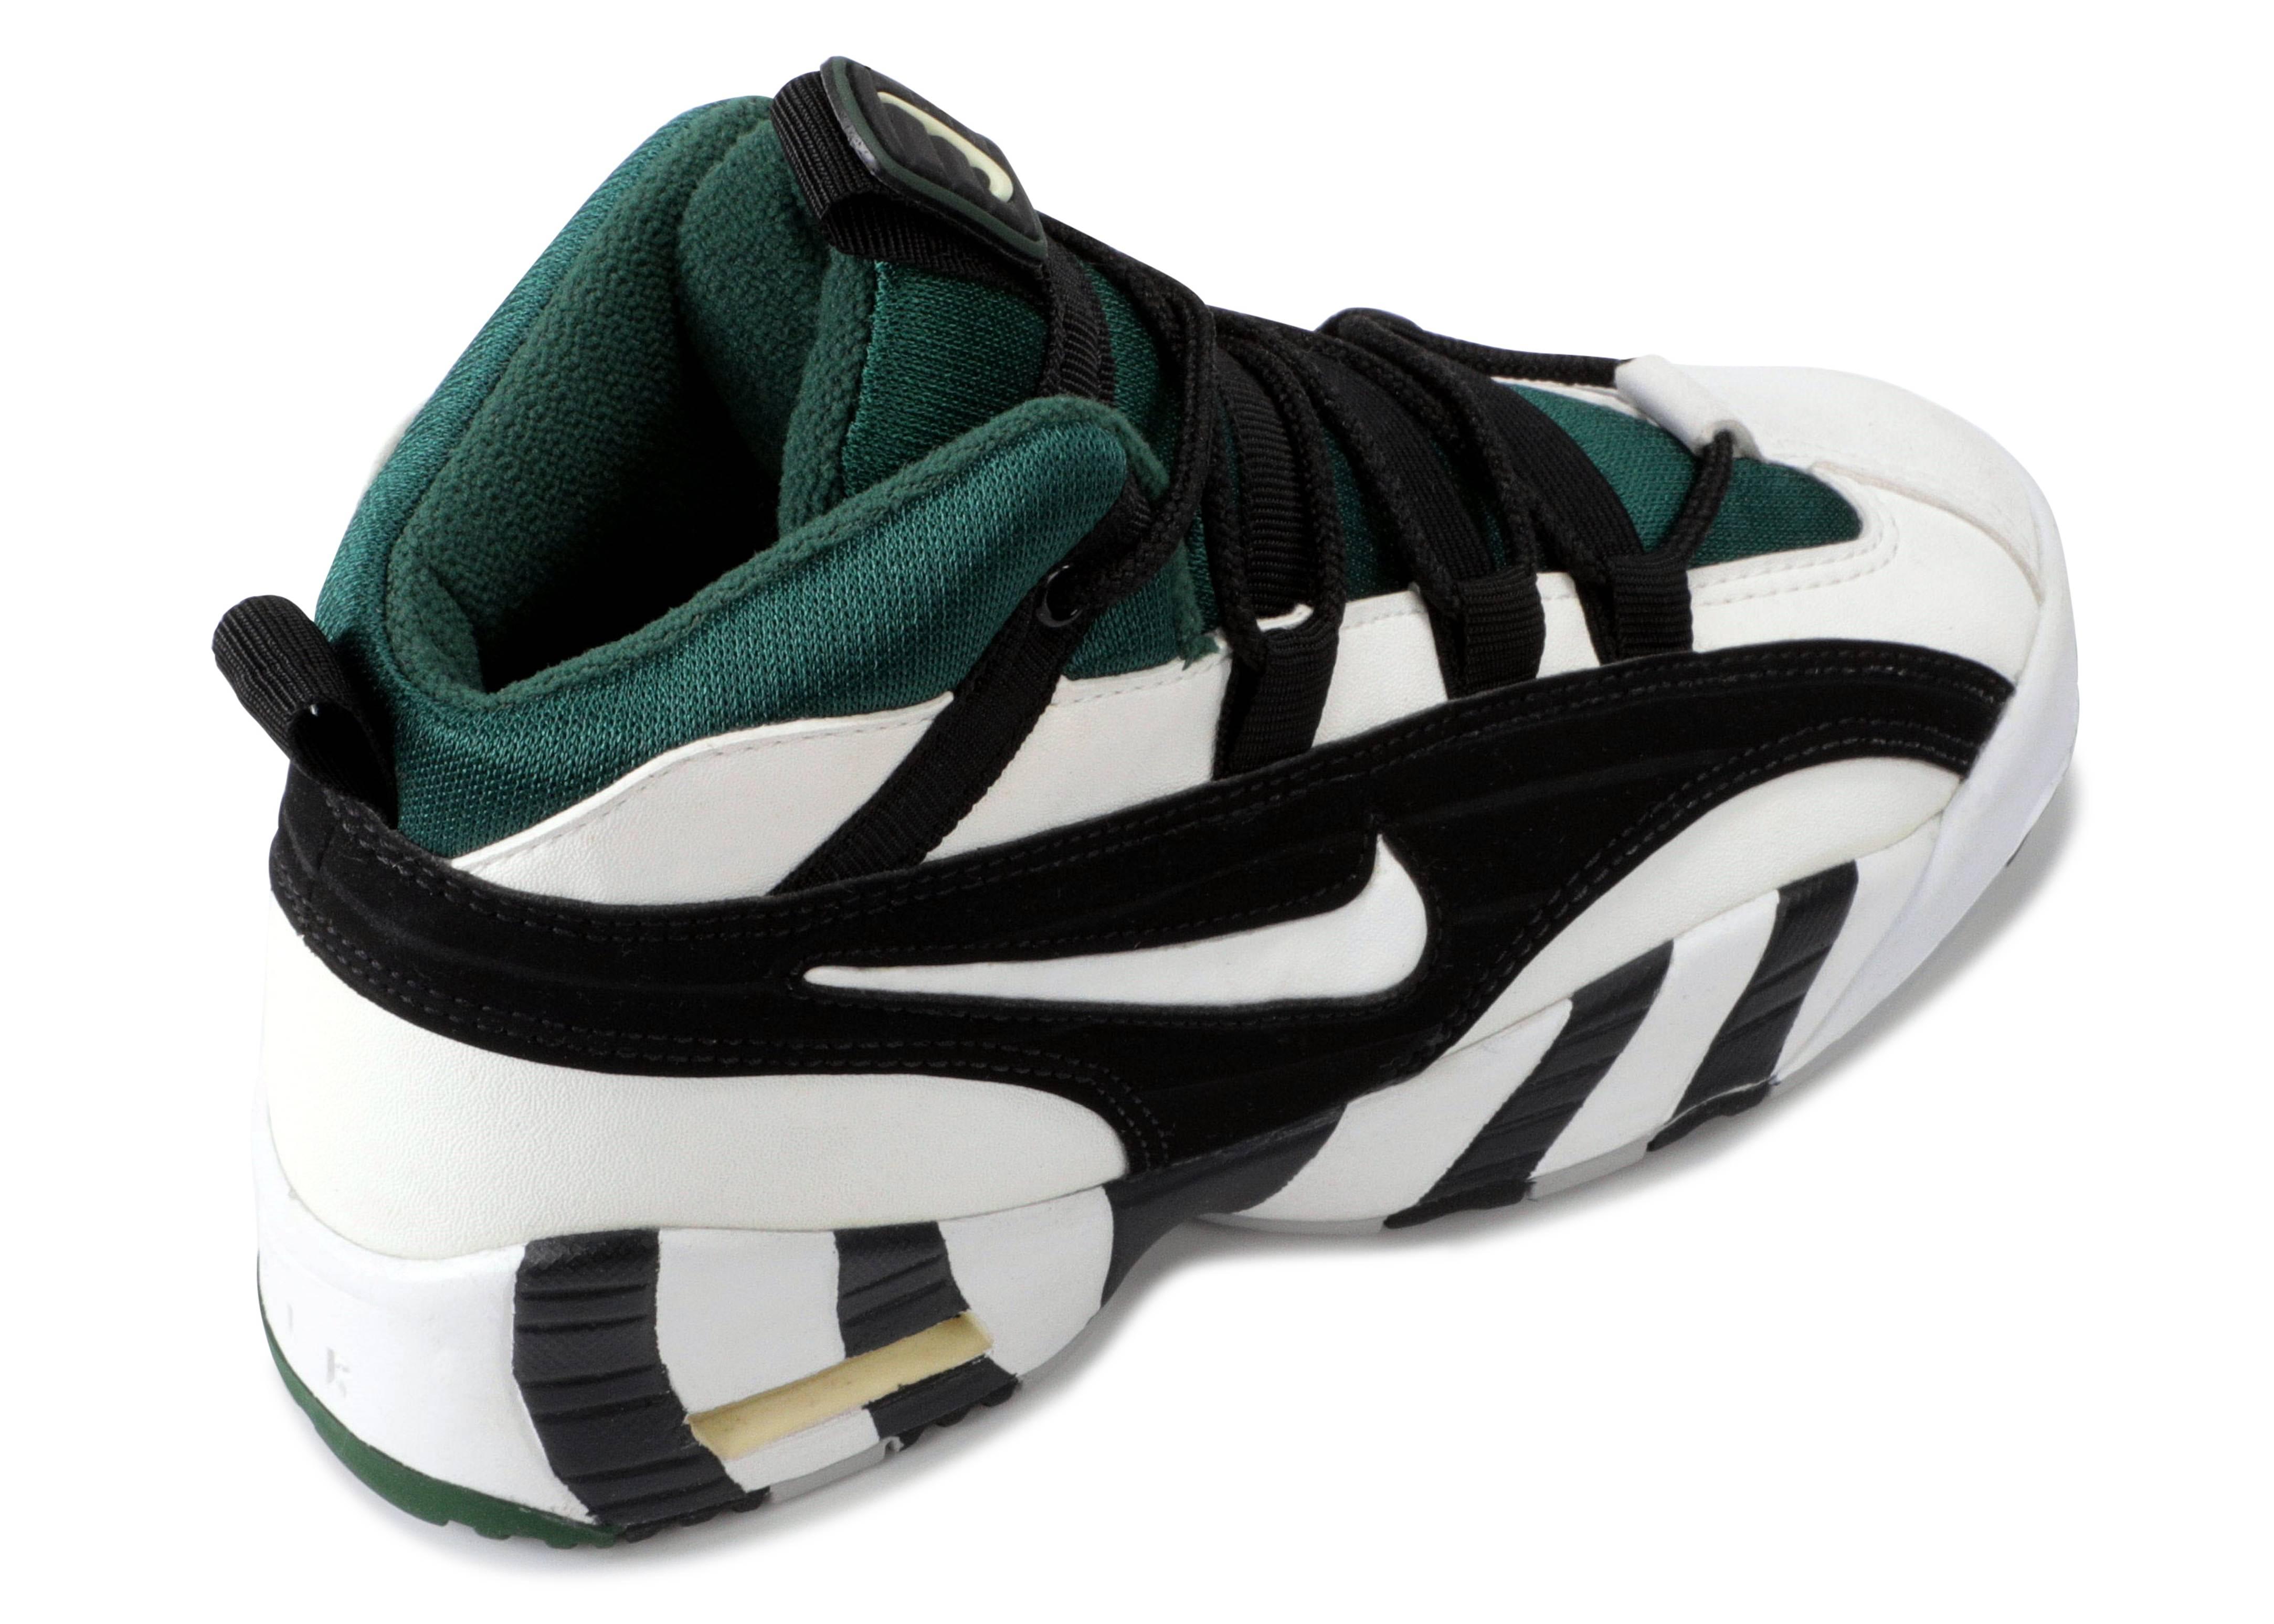 the best attitude e733d 3f68c Air Alarm - Nike - 153205 111 - whitewhite-black-deep forest  Flight Club